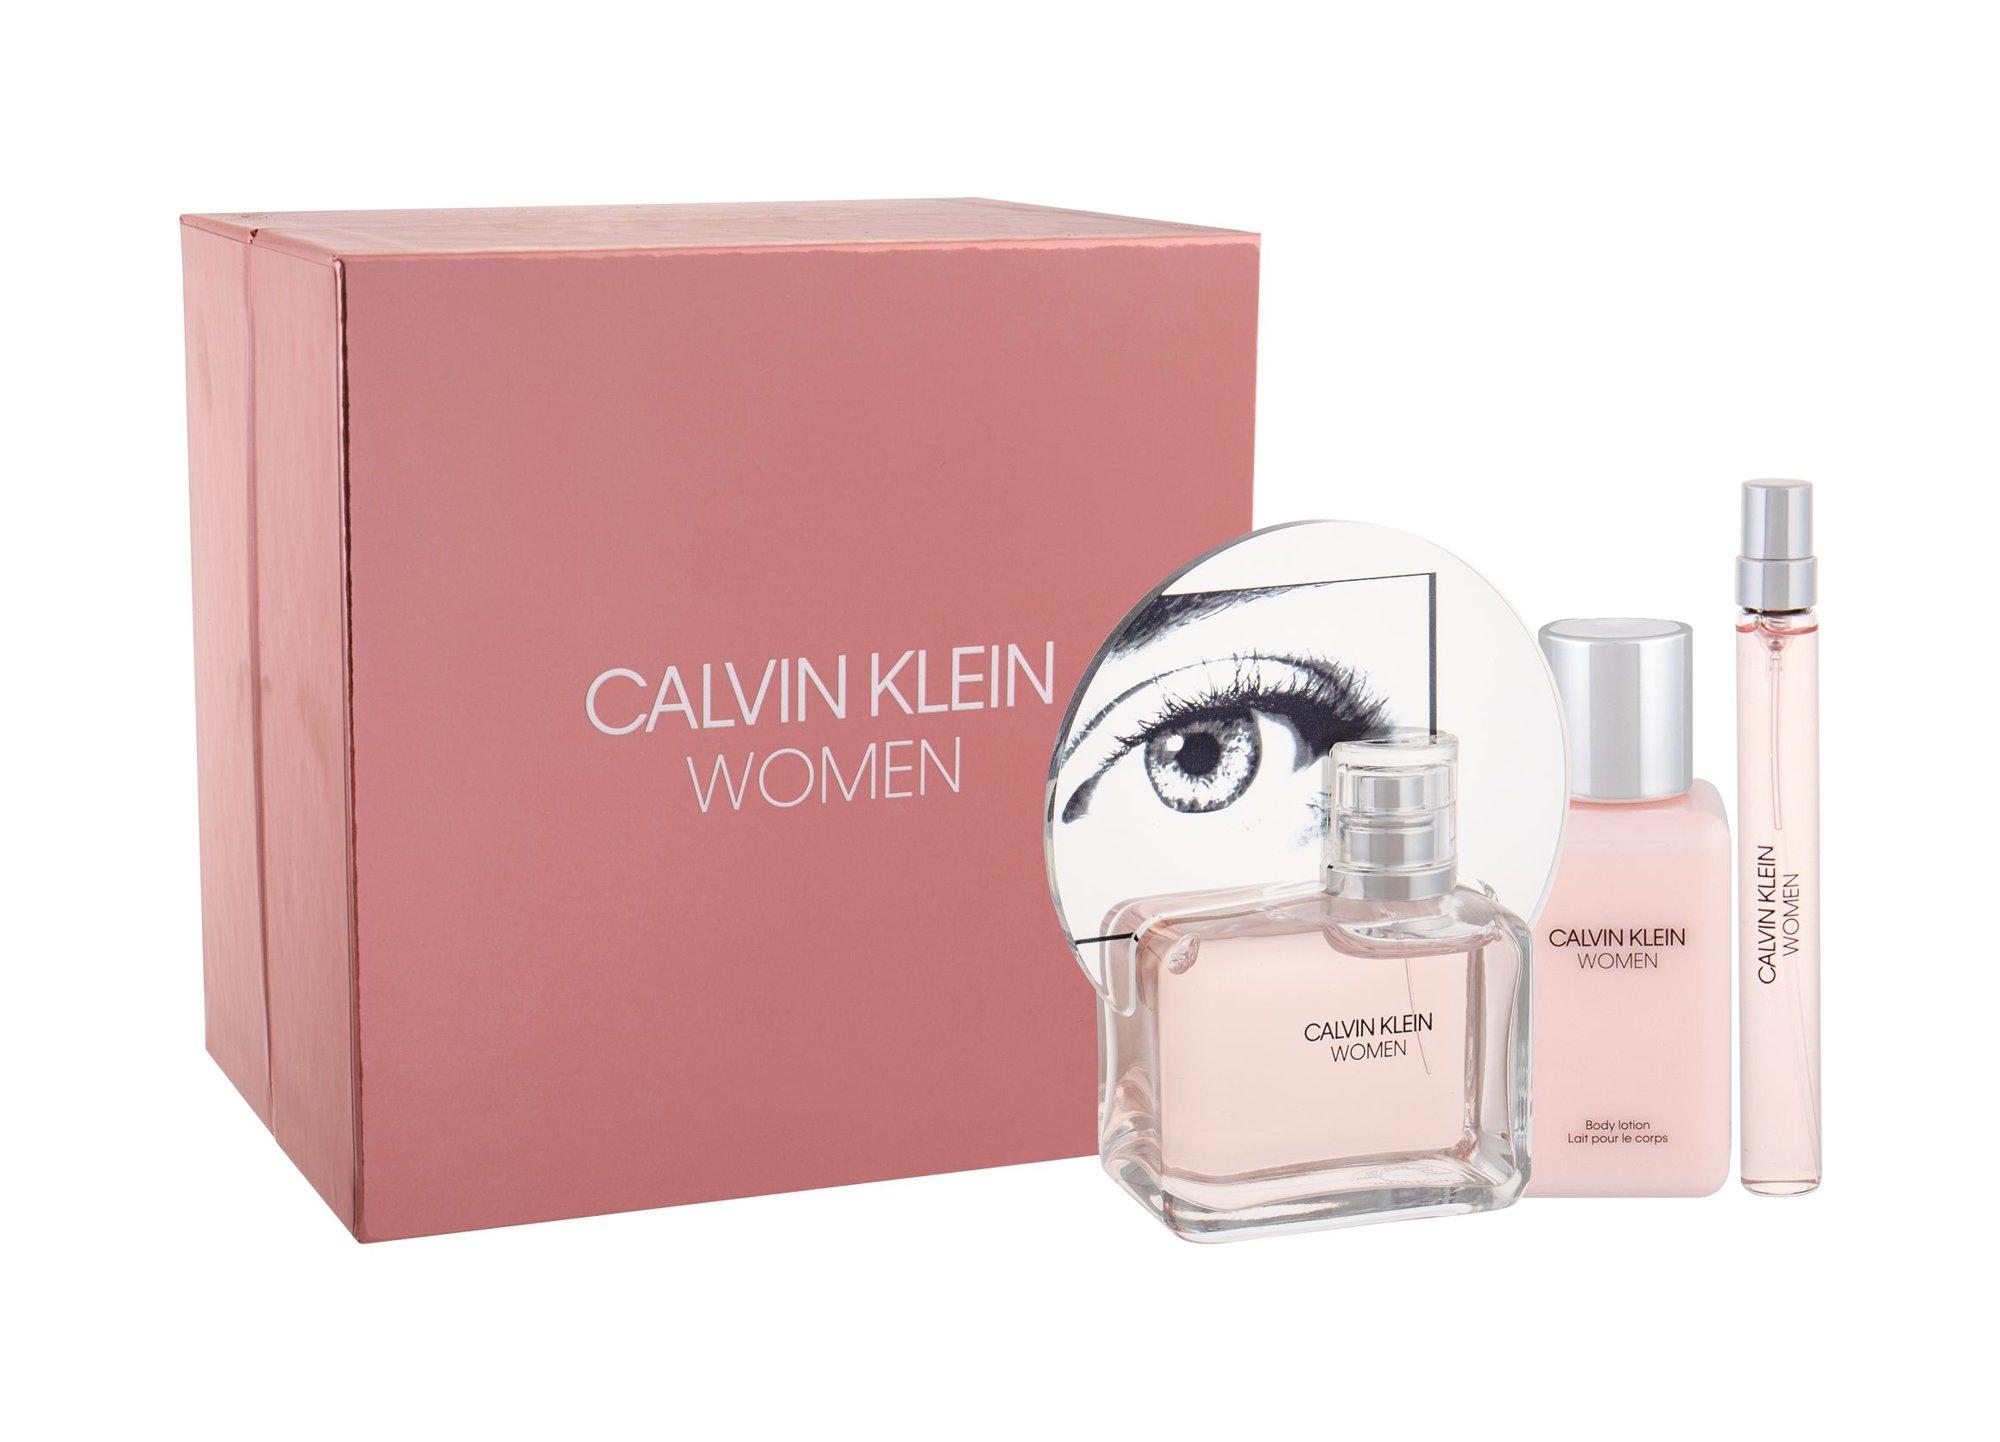 Calvin Klein Calvin Klein Women Eau de Parfum 100ml